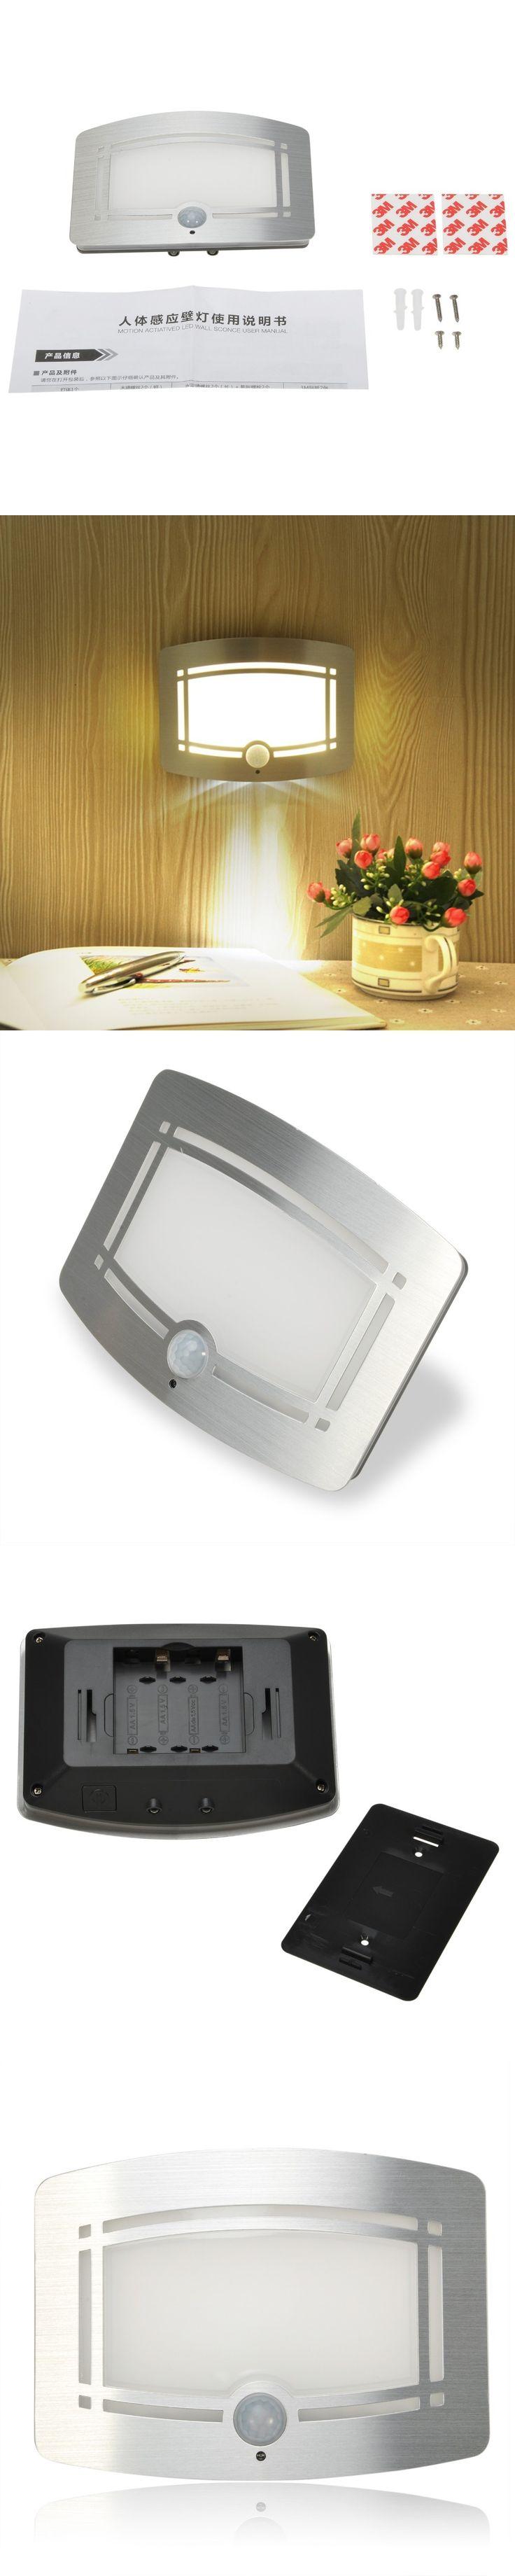 Night light Lamps Motion Sensor Night Light Intelligent LED Human Body Motion Induction wall Lamp